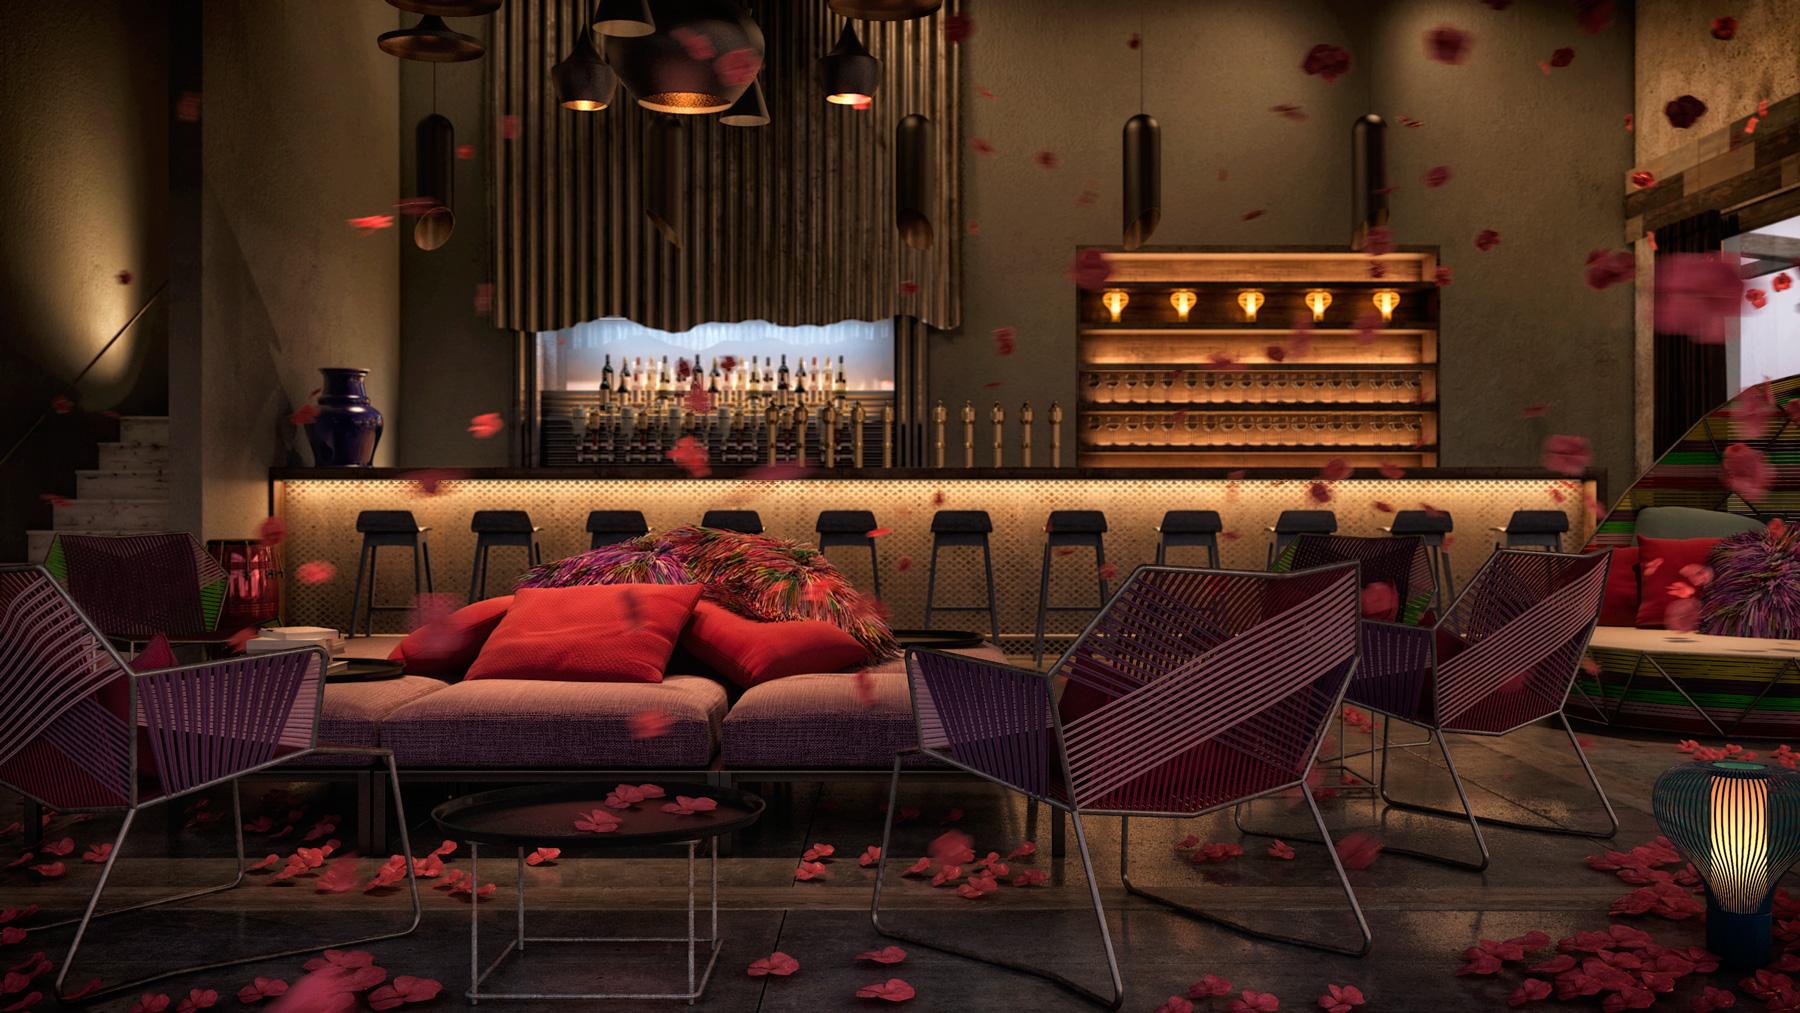 Colorful And Exuberant Home Interior Design Ideas Look So ...